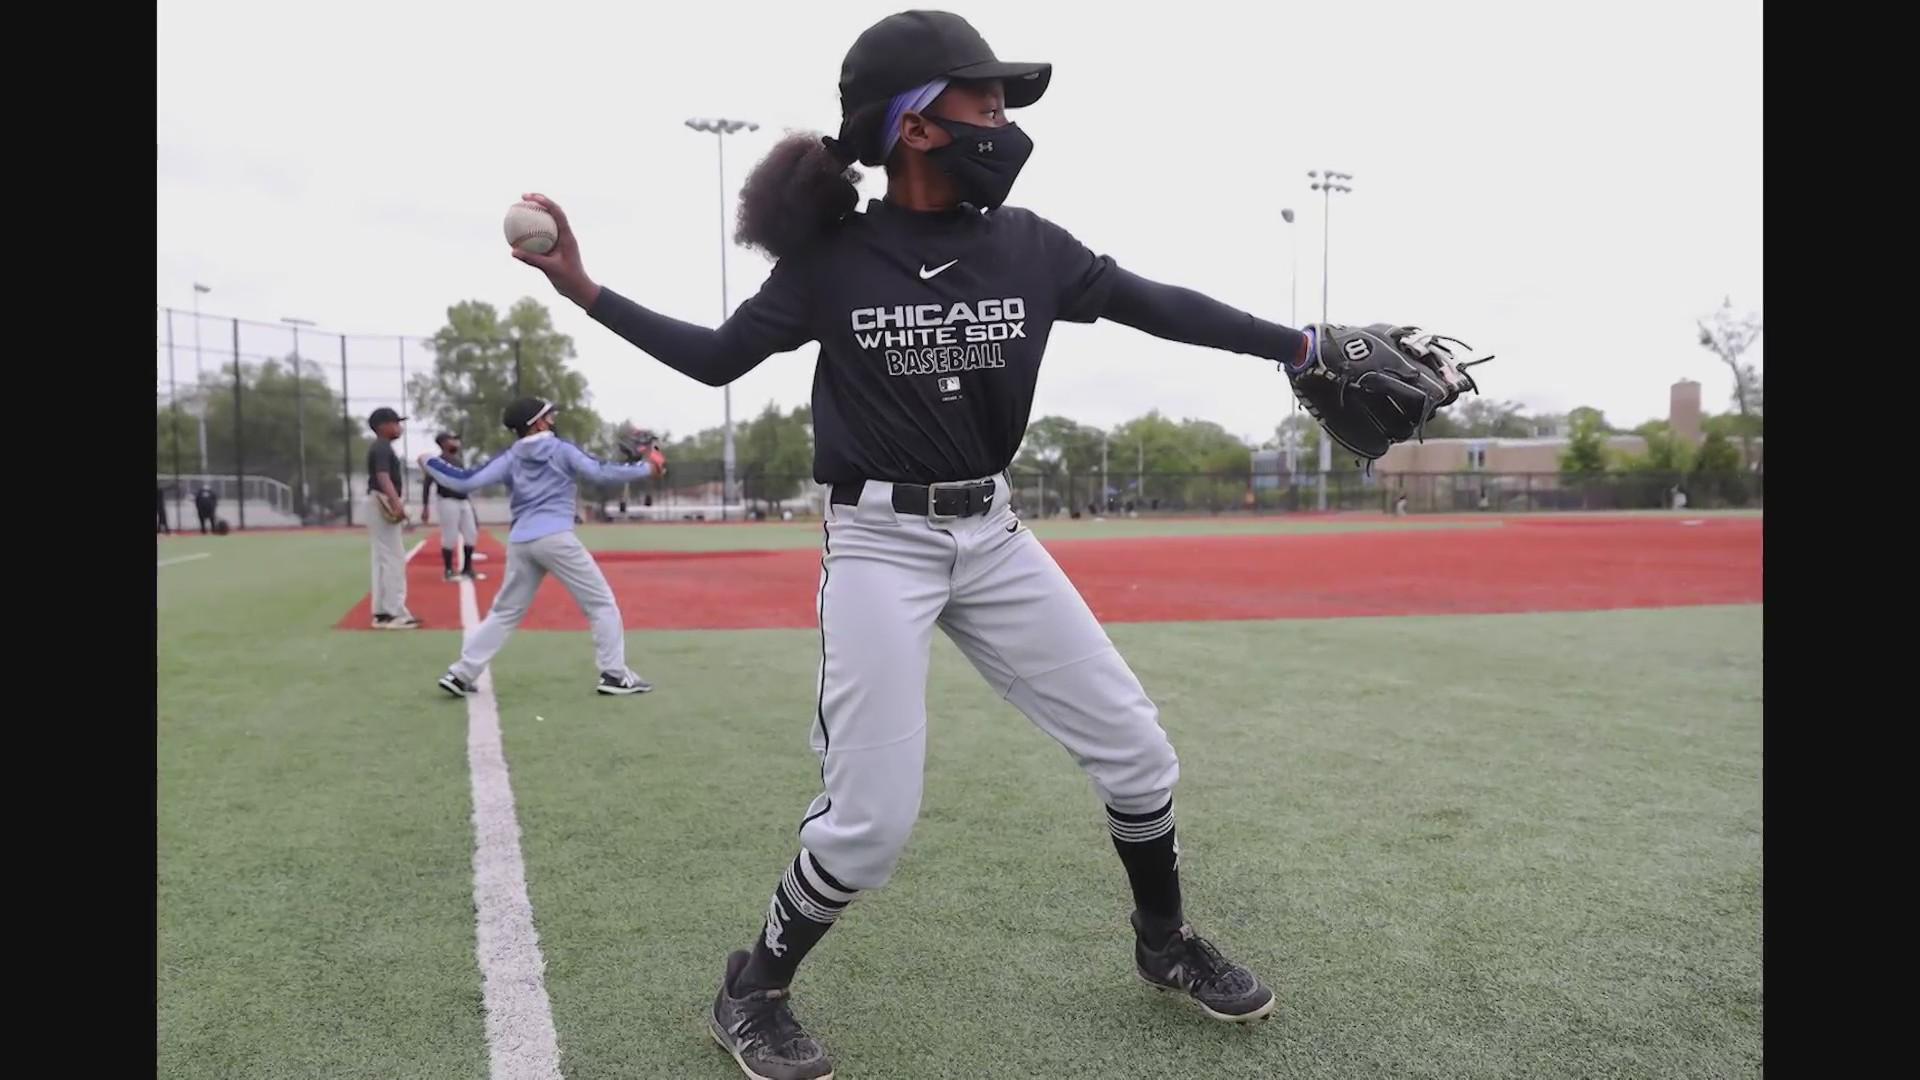 Feel Good Friday 12 Year Old Girl Makes It On White Sox S Elite Youth Baseball Team Wgn Tv